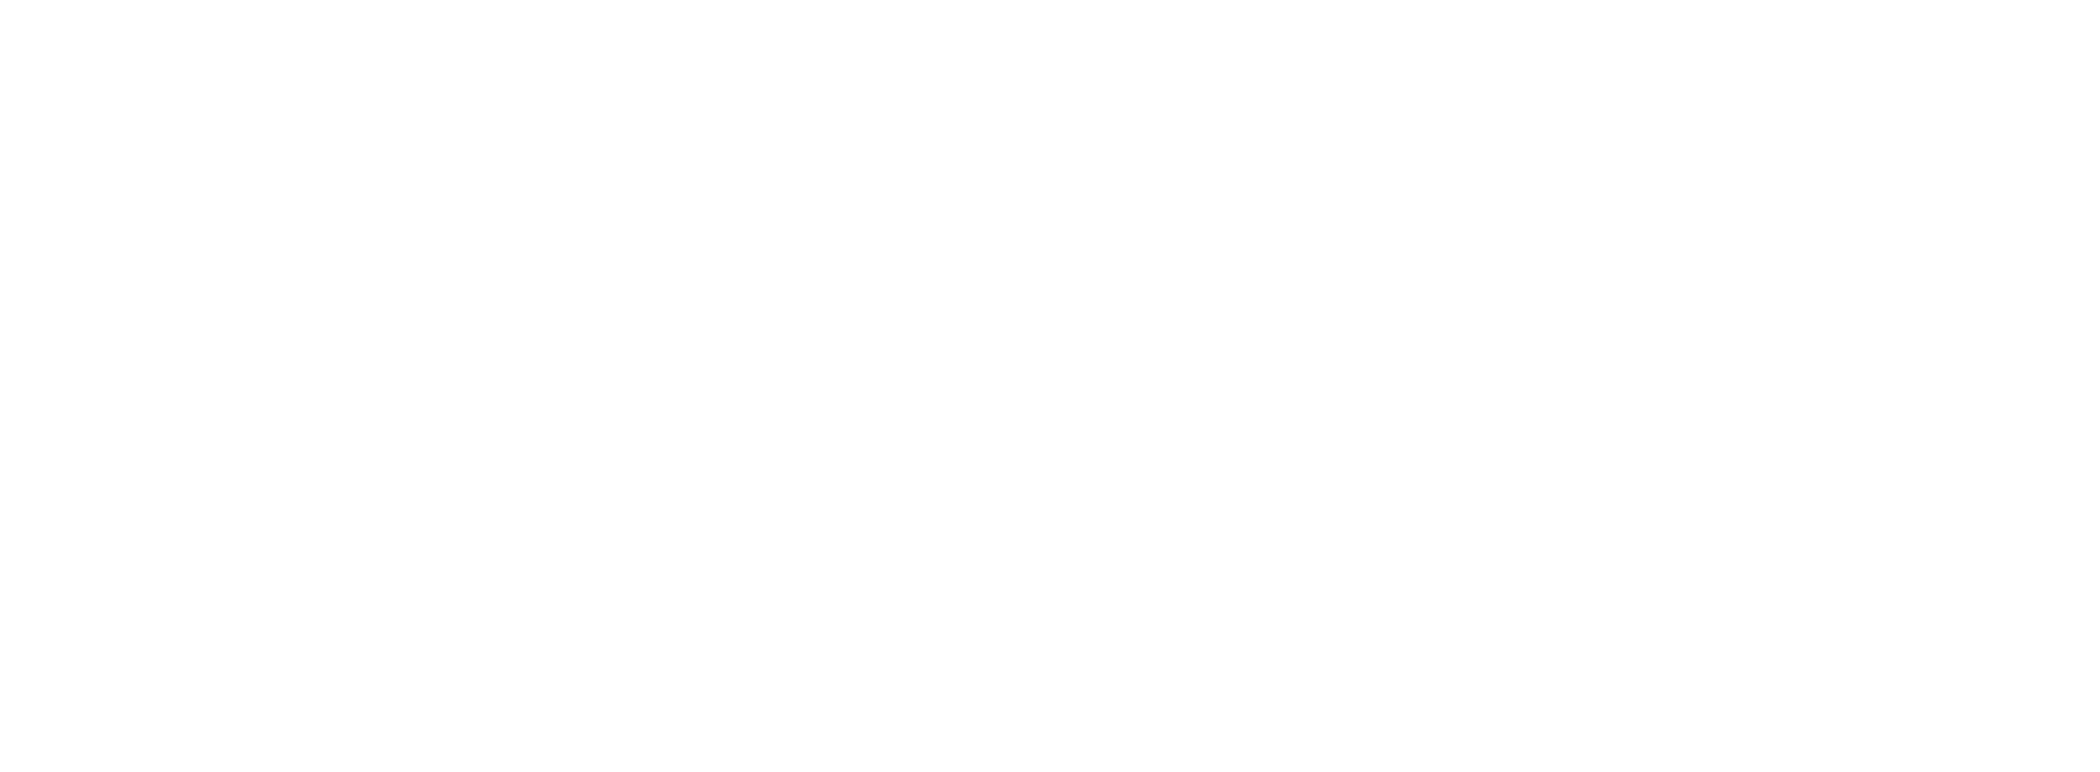 Company Logos clipart newspaper Logo Store Post Templates Huffington